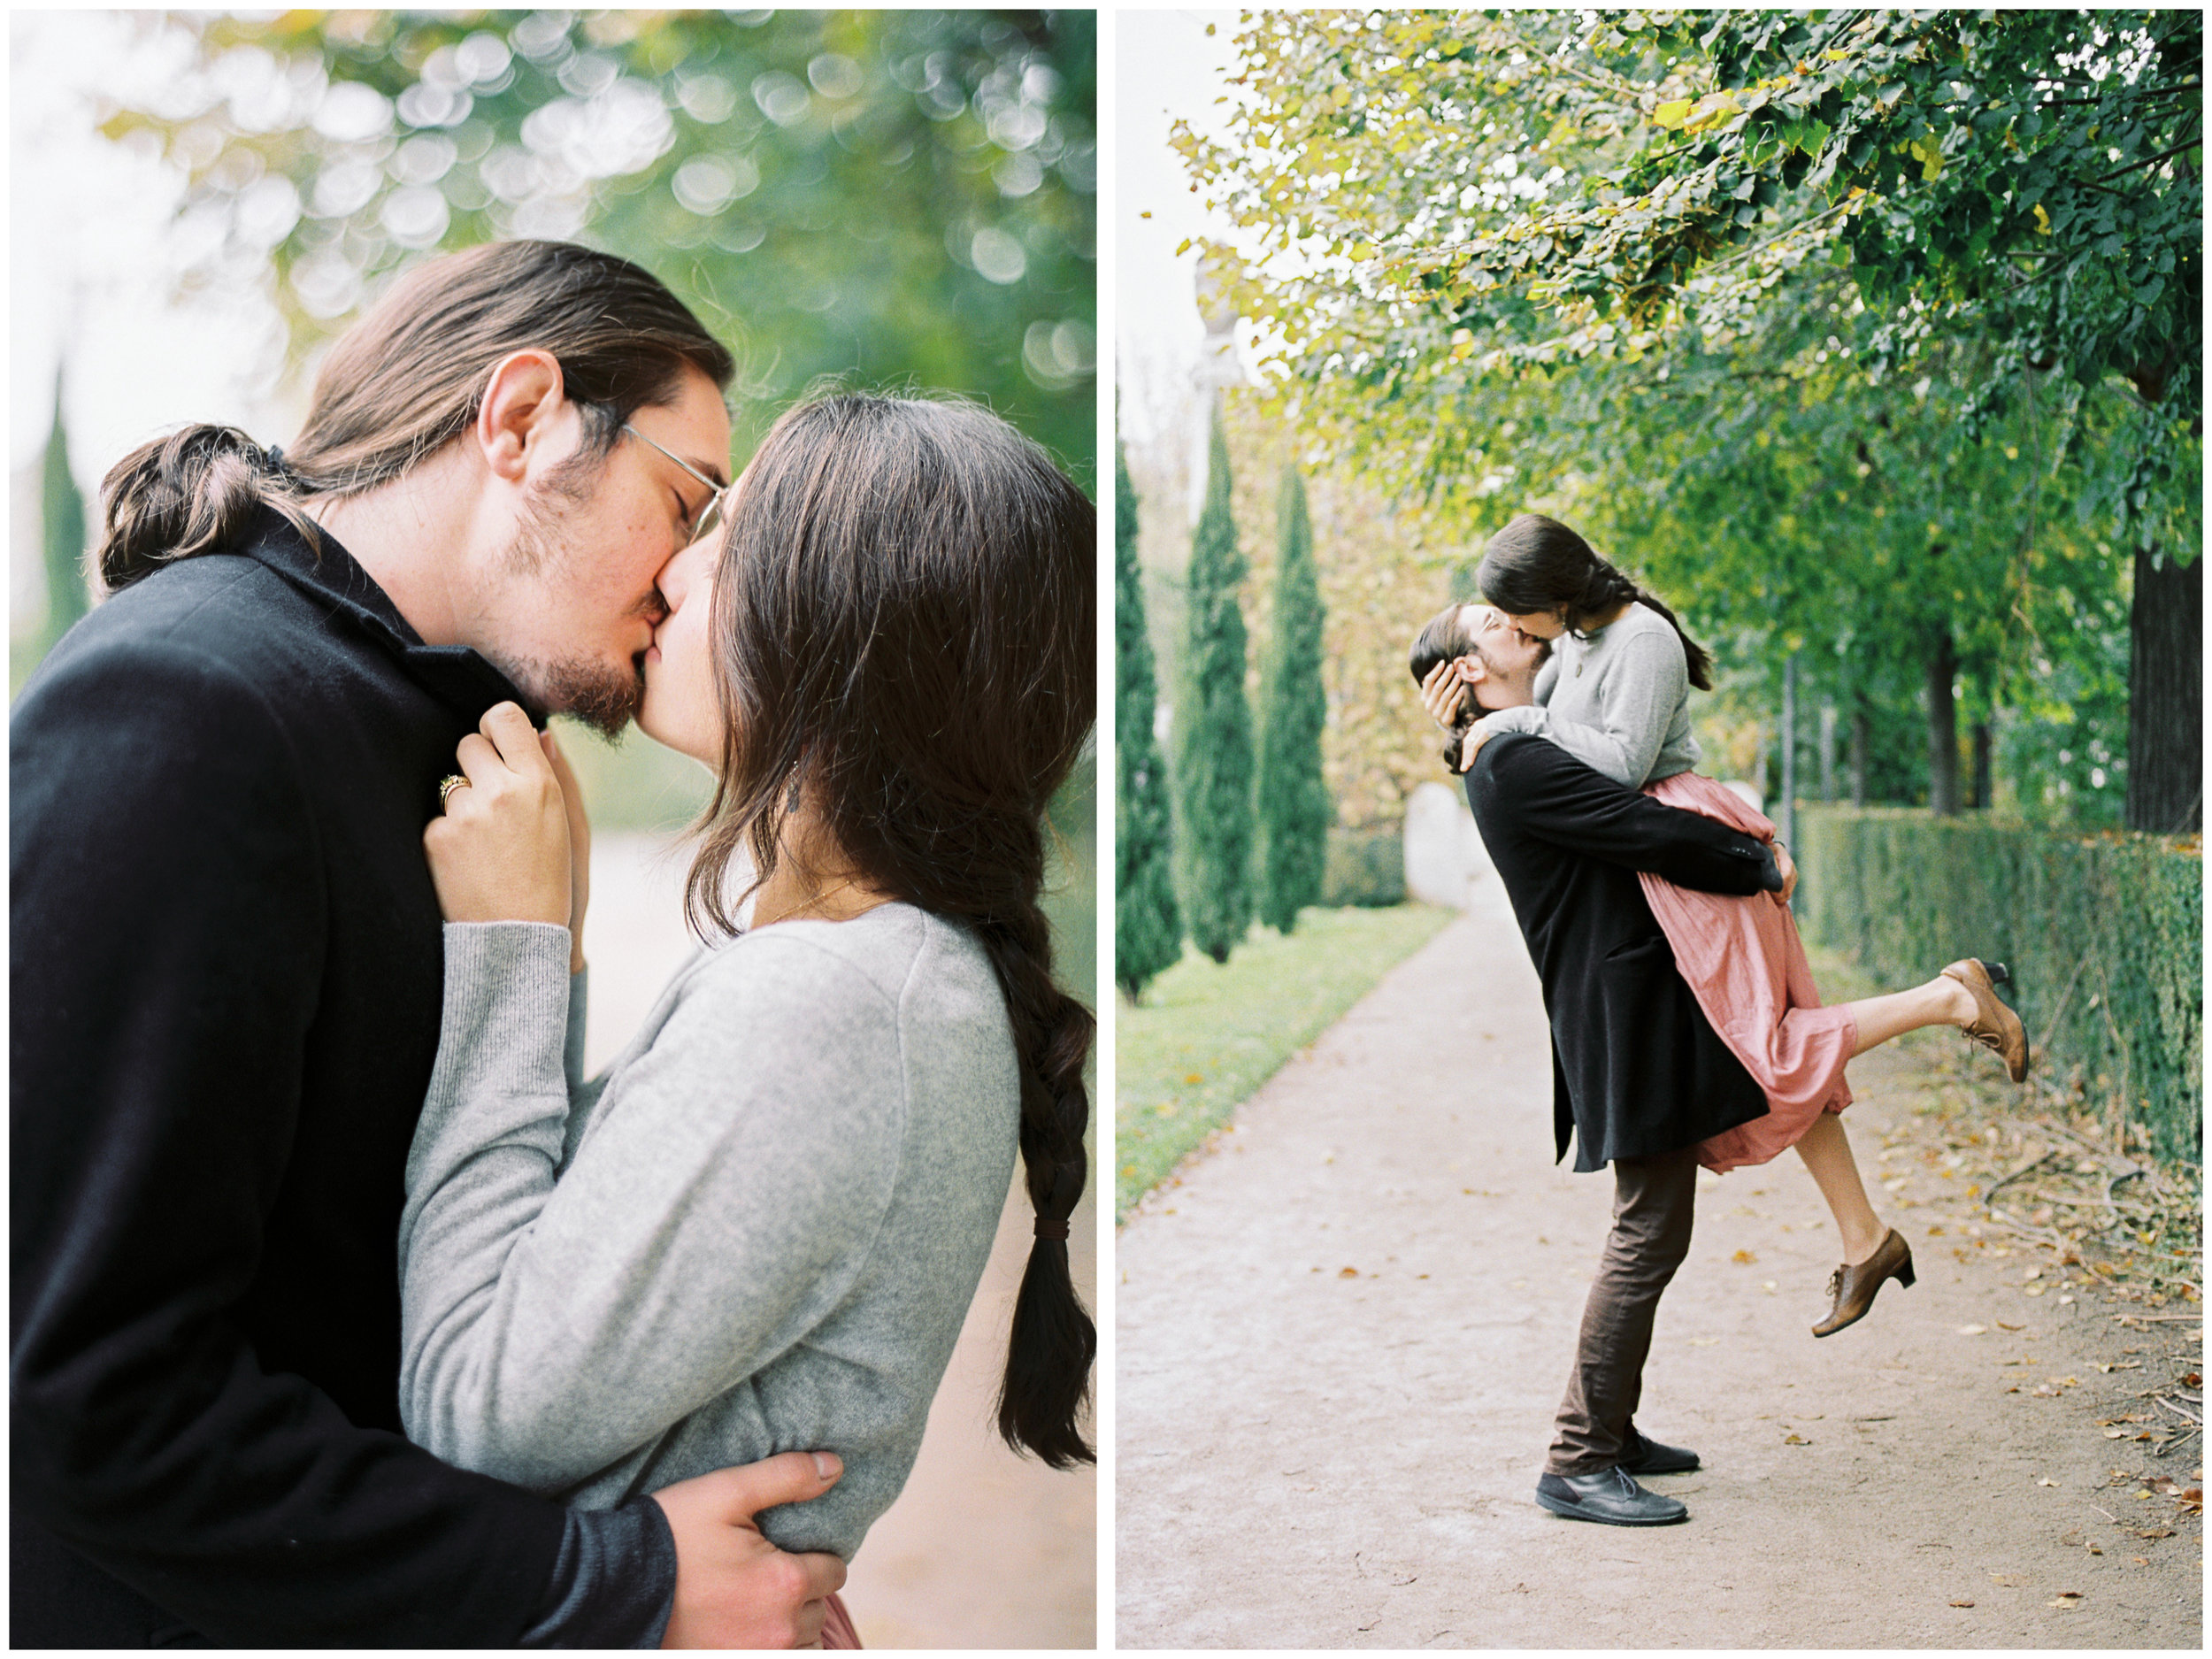 Wedding Photography | Vienna, Austria | Fuji400H | Contax645 | Vienna Film Photographer | Michelle Mock Photography